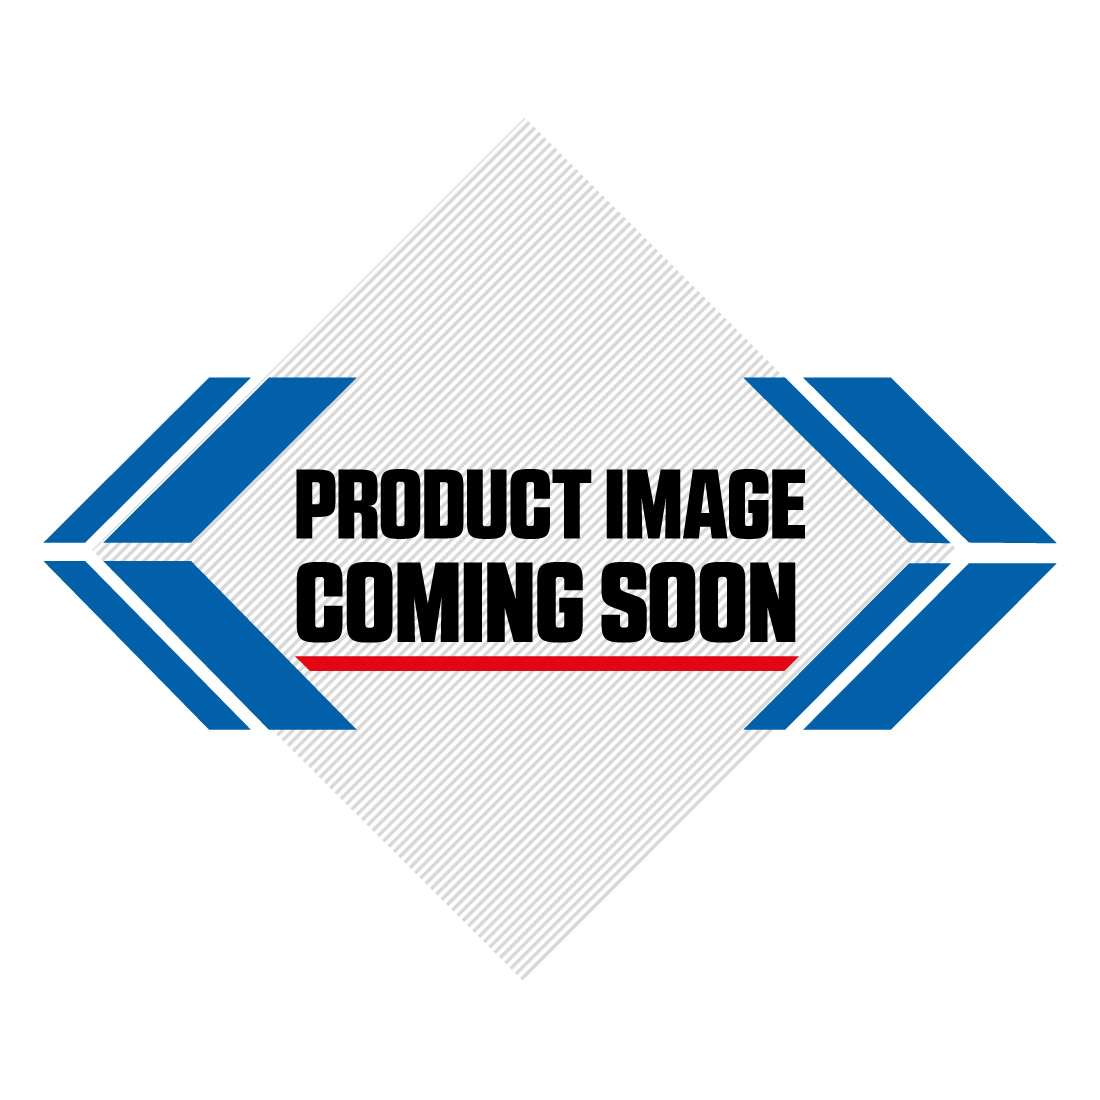 DJI Mavic 2 Pro Drone Image-0